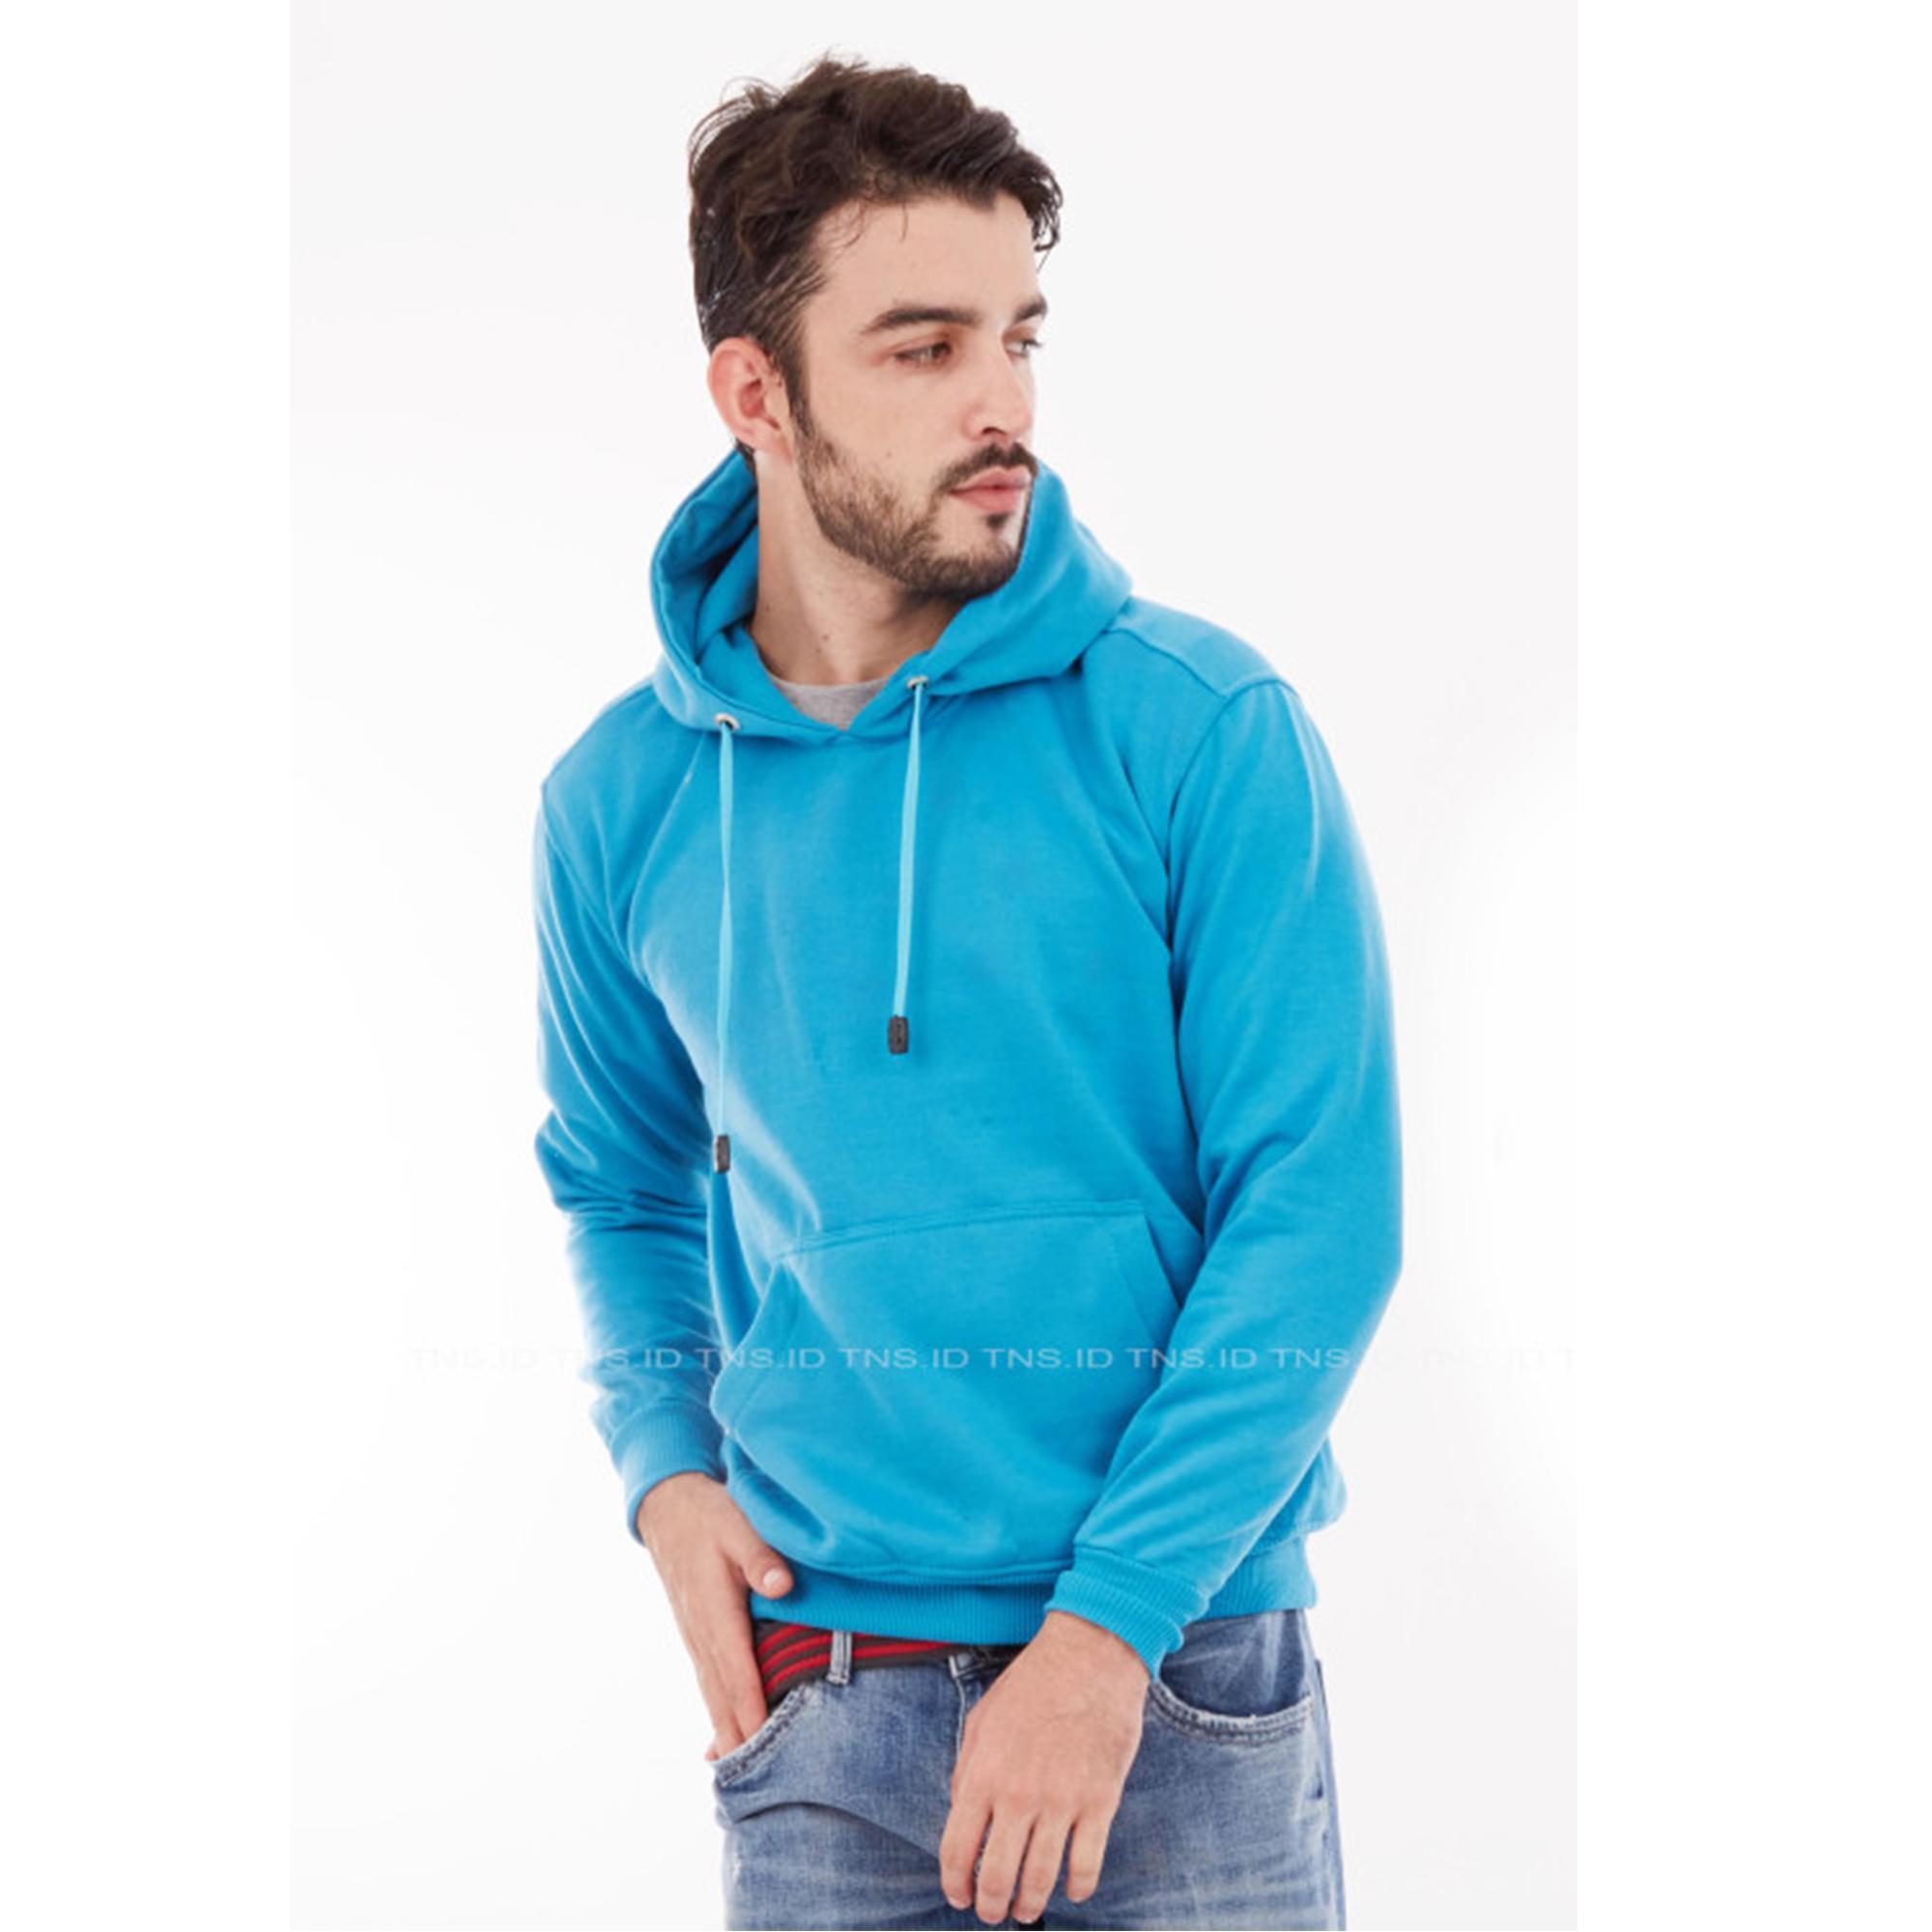 Fashion Bajukitaindonesia Jacket Daftar Harga Dailydarling Orcha One Shoulder Blue Biru Muda M November 2018